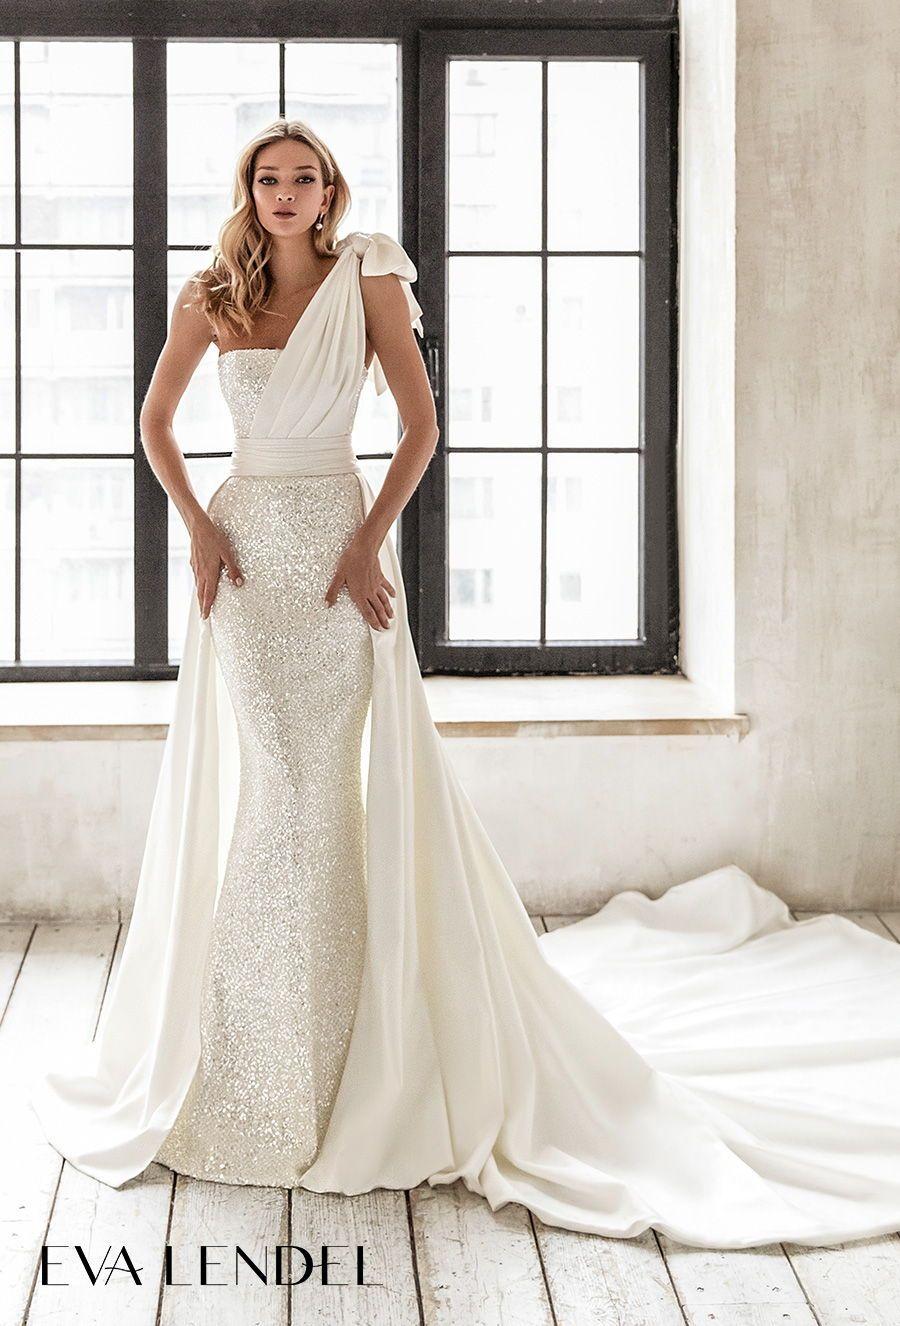 Eva Lendel 2021 Wedding Dresses Less Is More Bridal Collection Wedding Inspirasi Straight Wedding Dresses Wedding Dresses Wedding Dress Trends [ 1326 x 900 Pixel ]